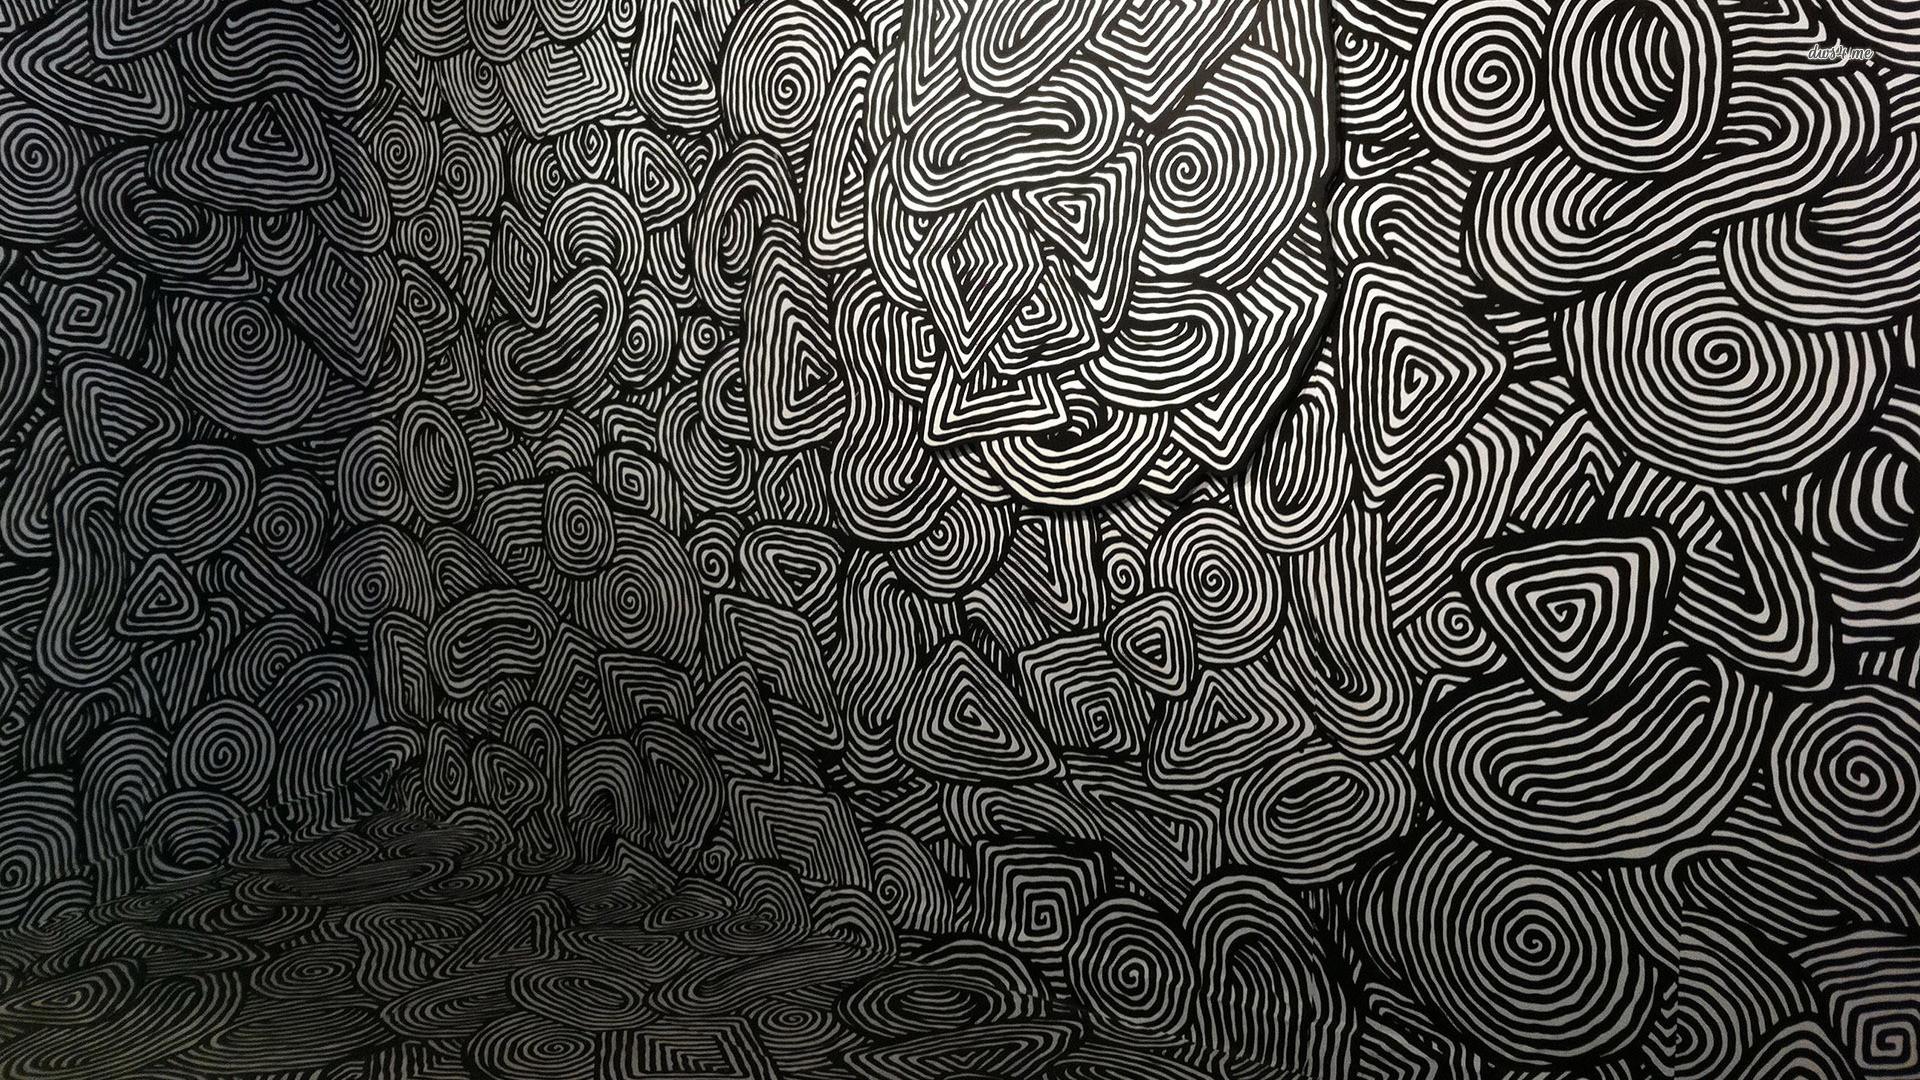 Psychedelic Desktop Wallpaper HD   dlwallhd 1920x1080